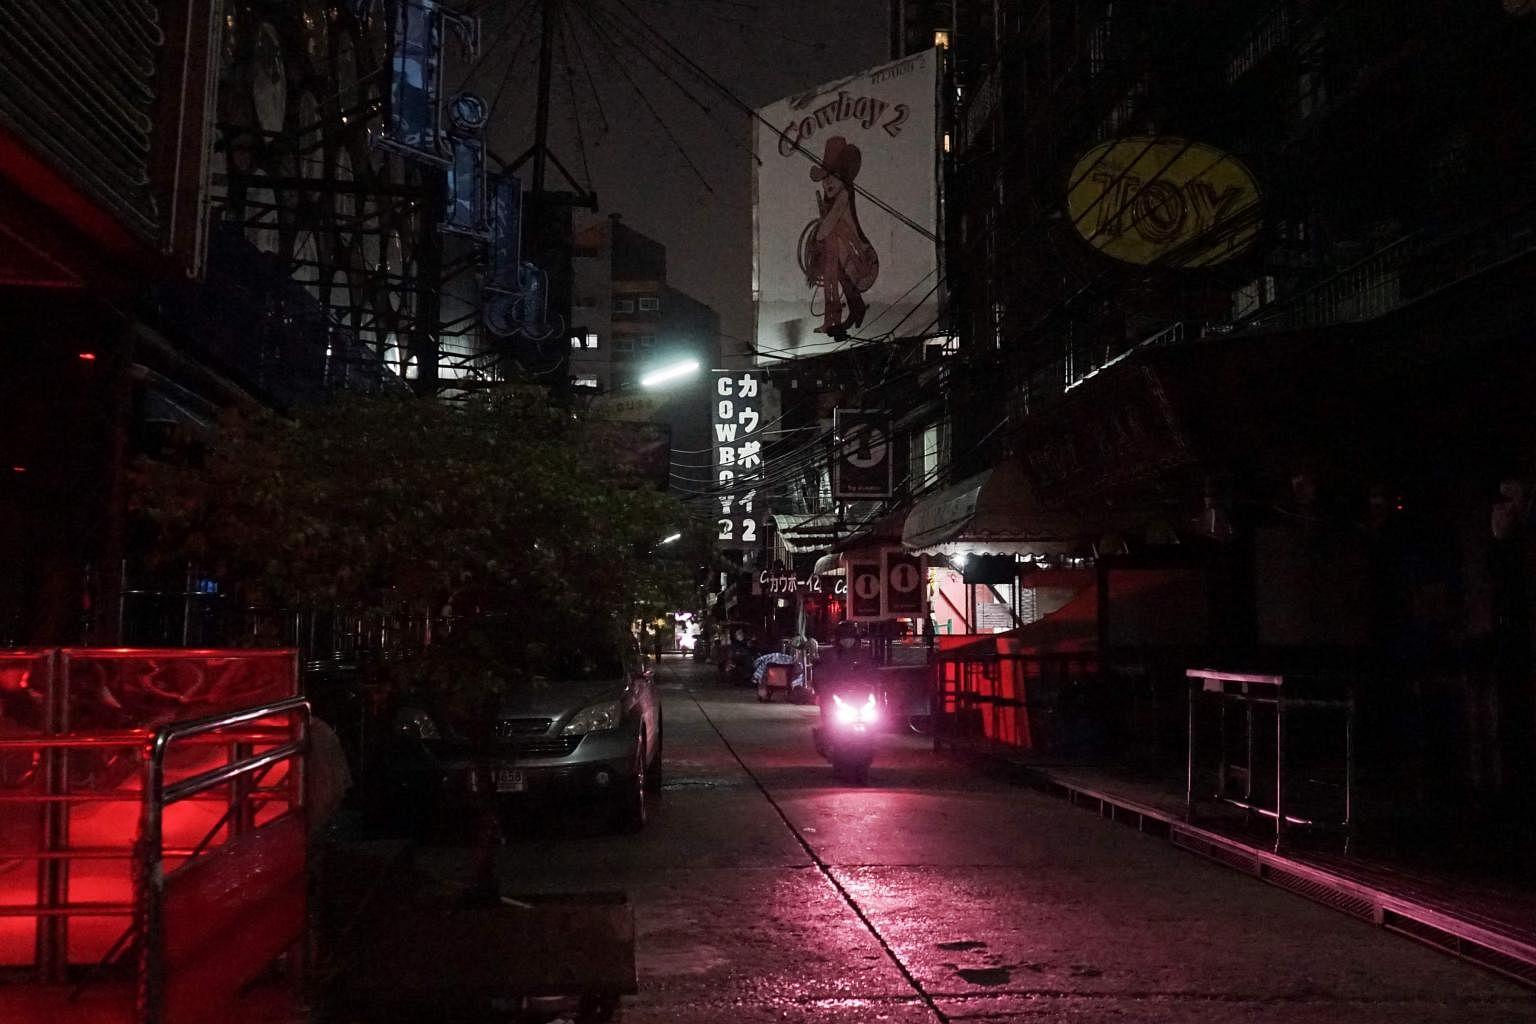 Bangkok Prostitution Street